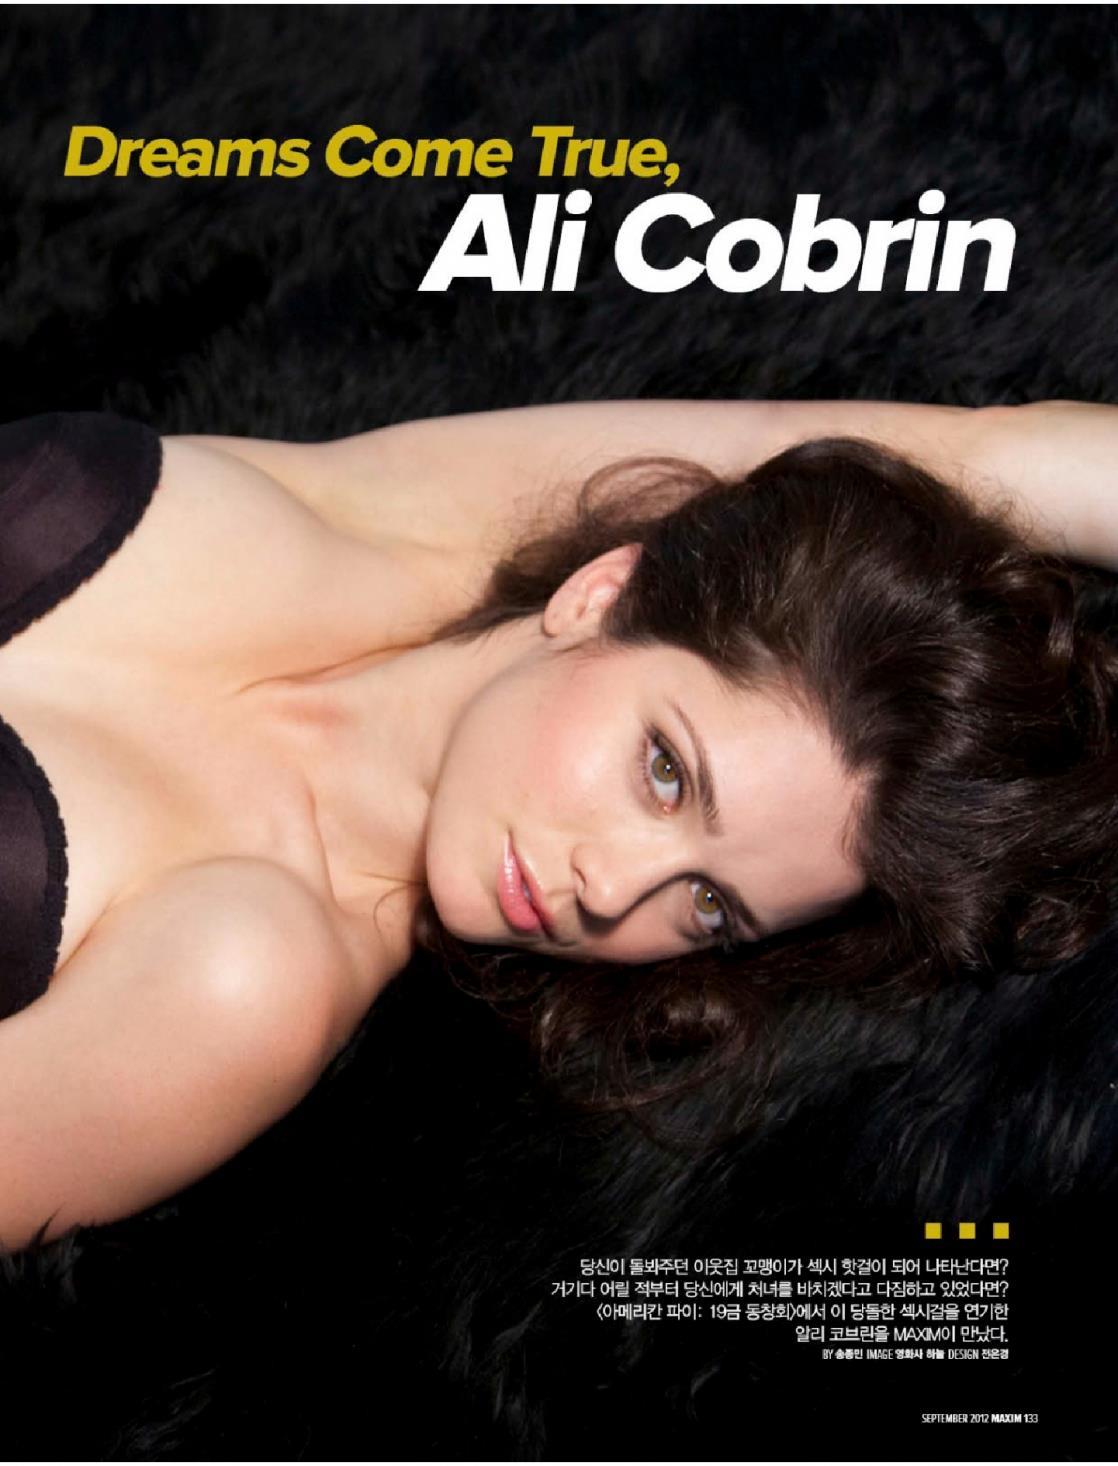 Ali Cobrin